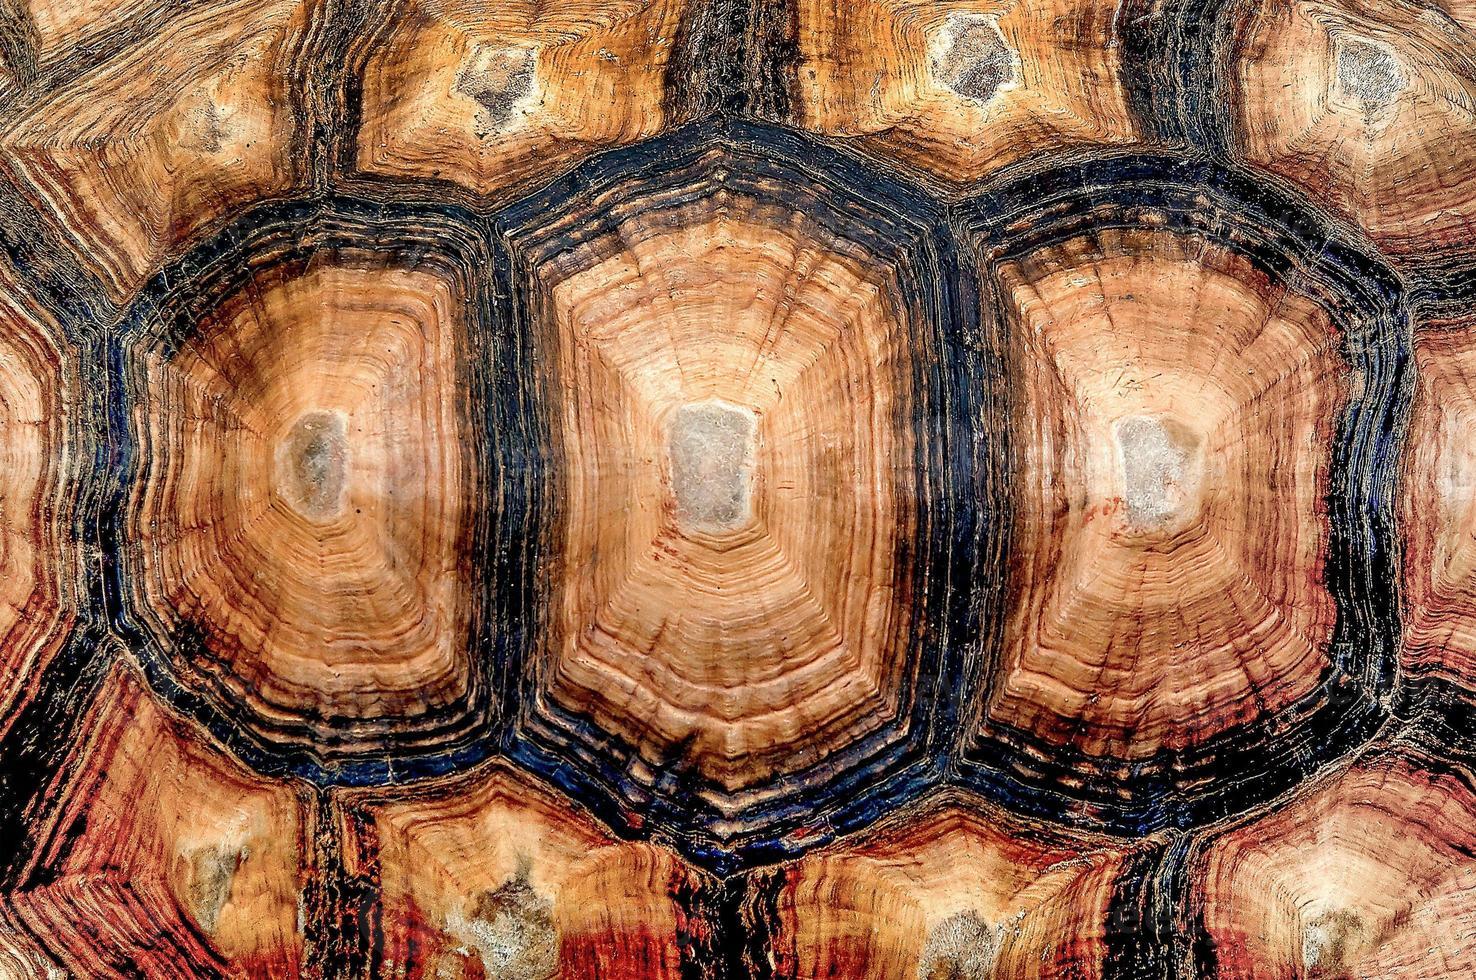 Vista cercana de caparazón de tortuga foto